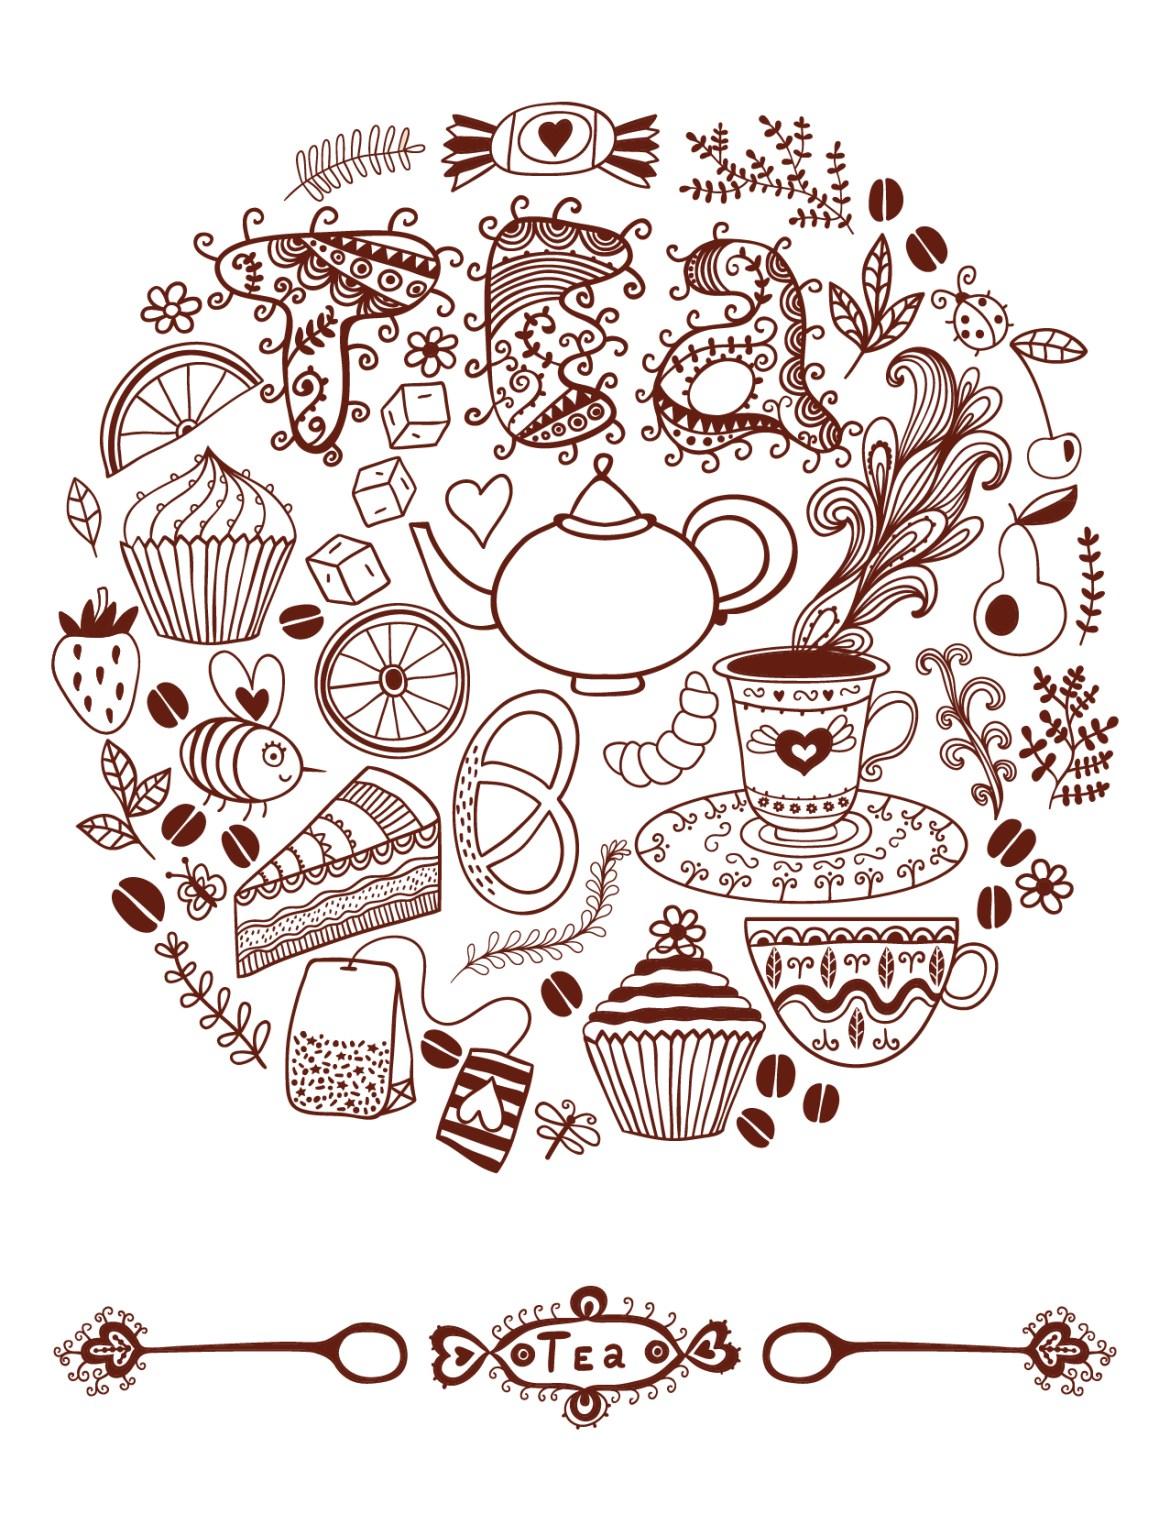 Doodle artherapie tea time à dessiner pour adulte